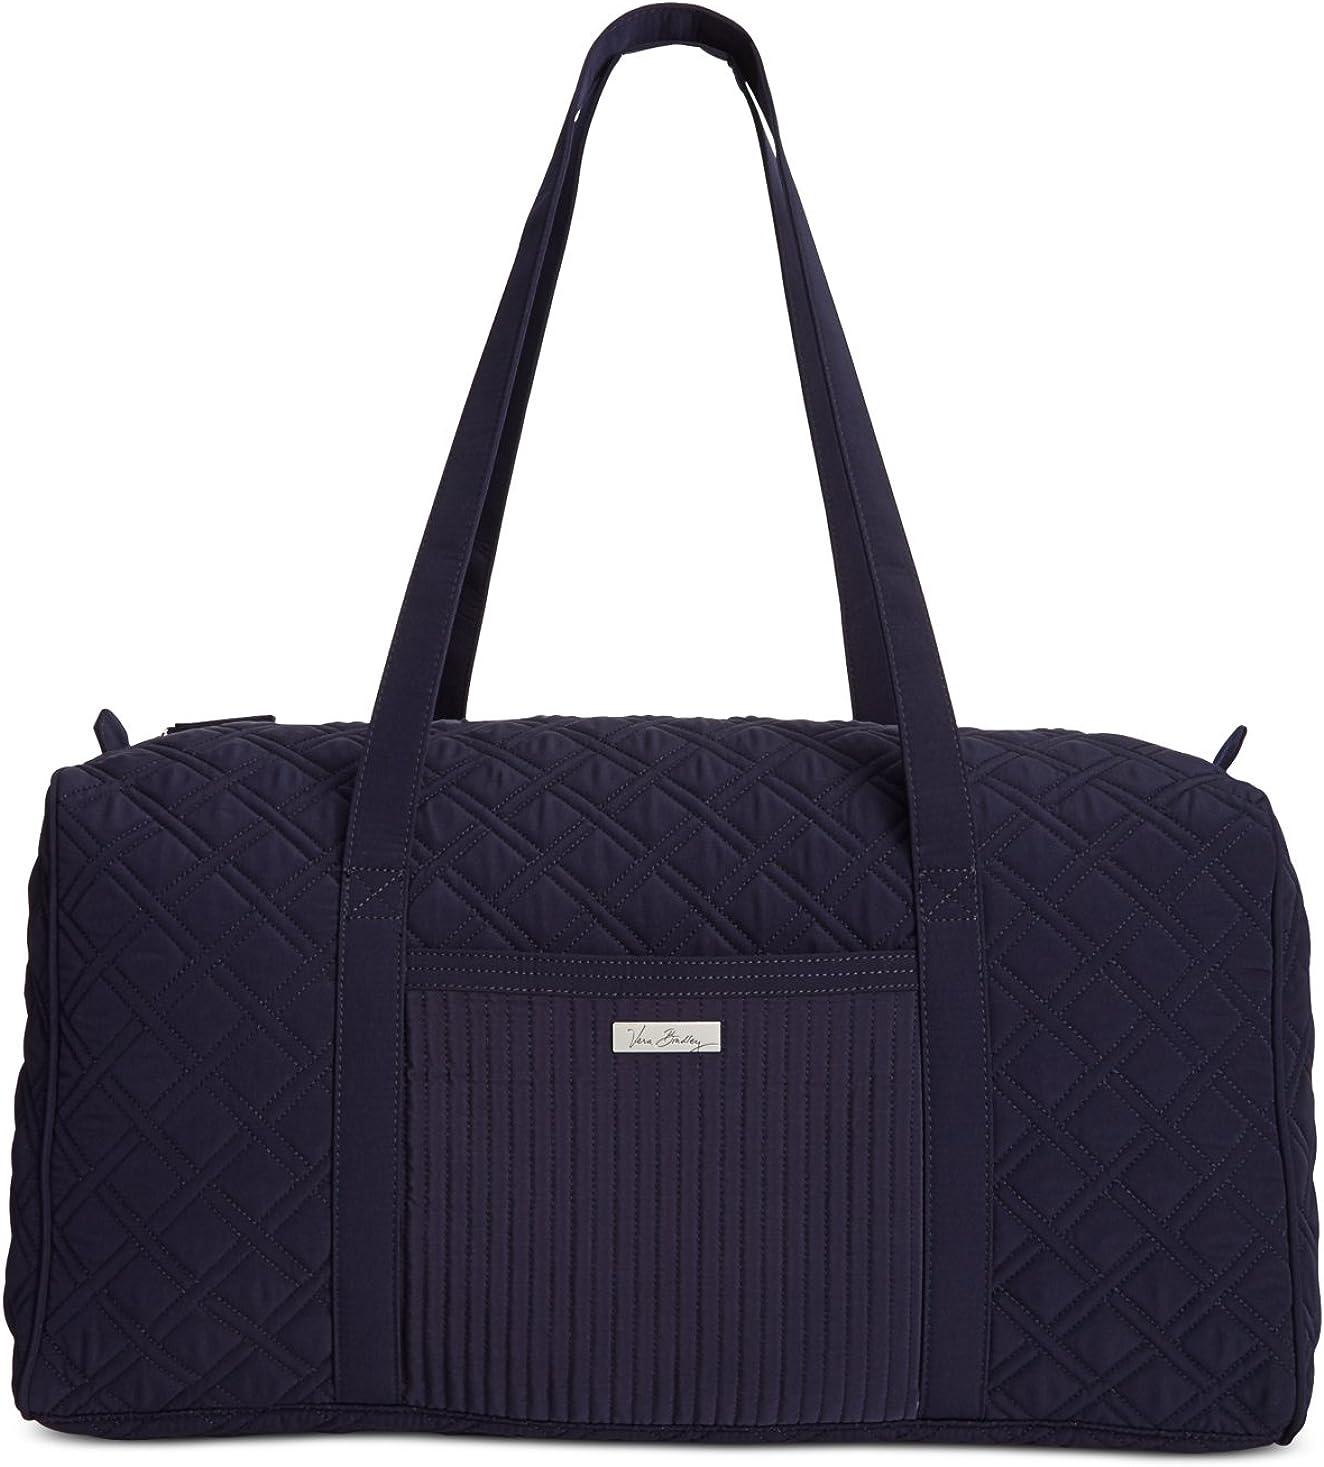 Vera Bradley Large Duffel Bag in Classic Navy